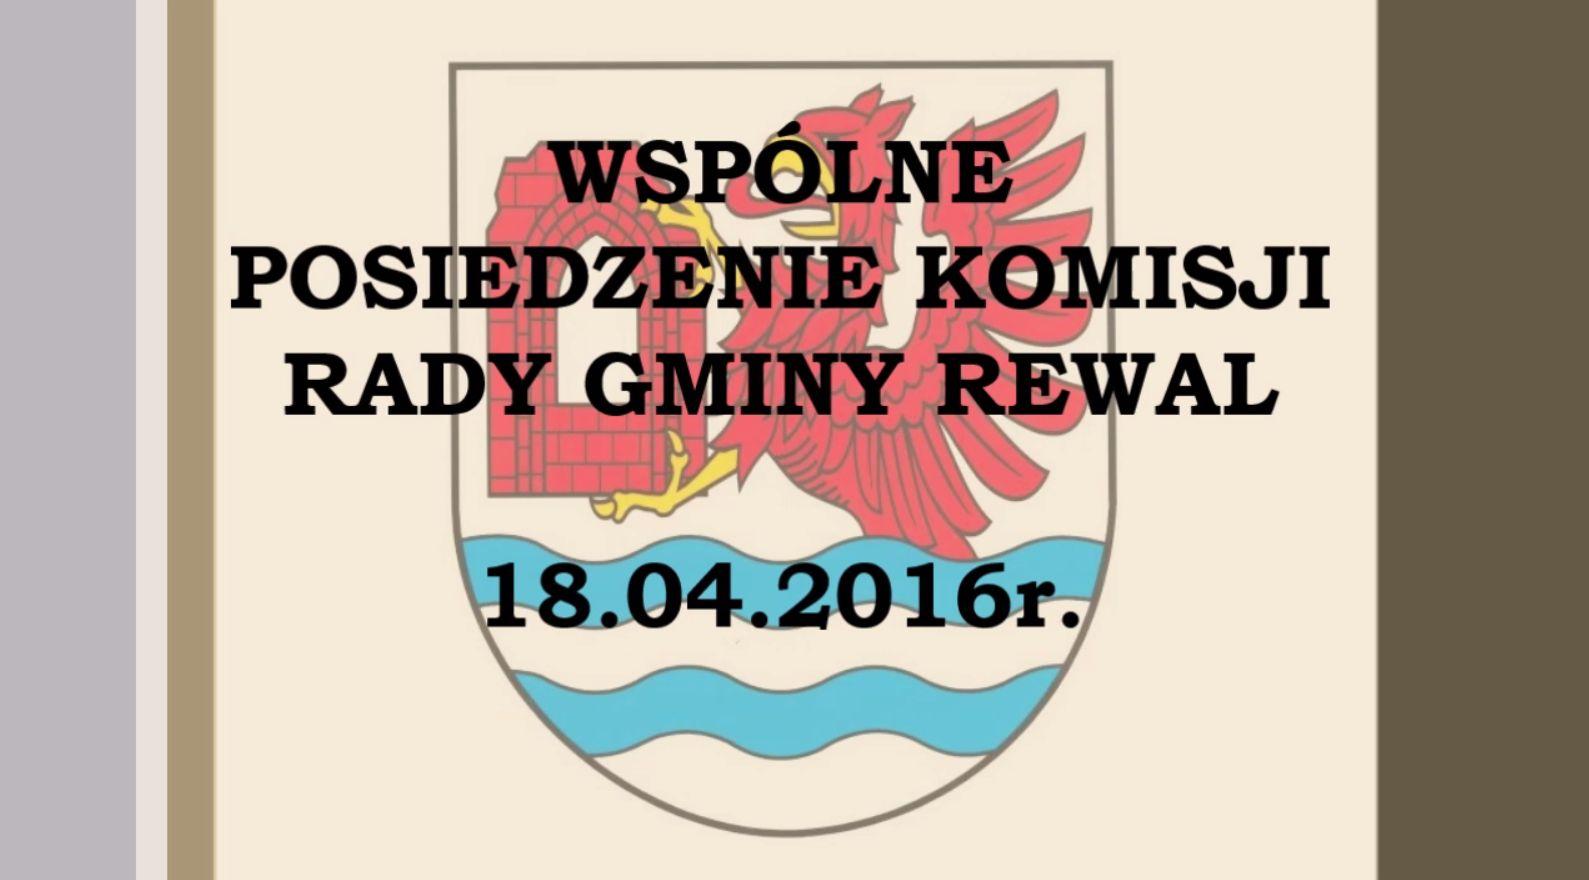 rewal/2016-020.Komisje_wspolne_18-04-2016.jpg